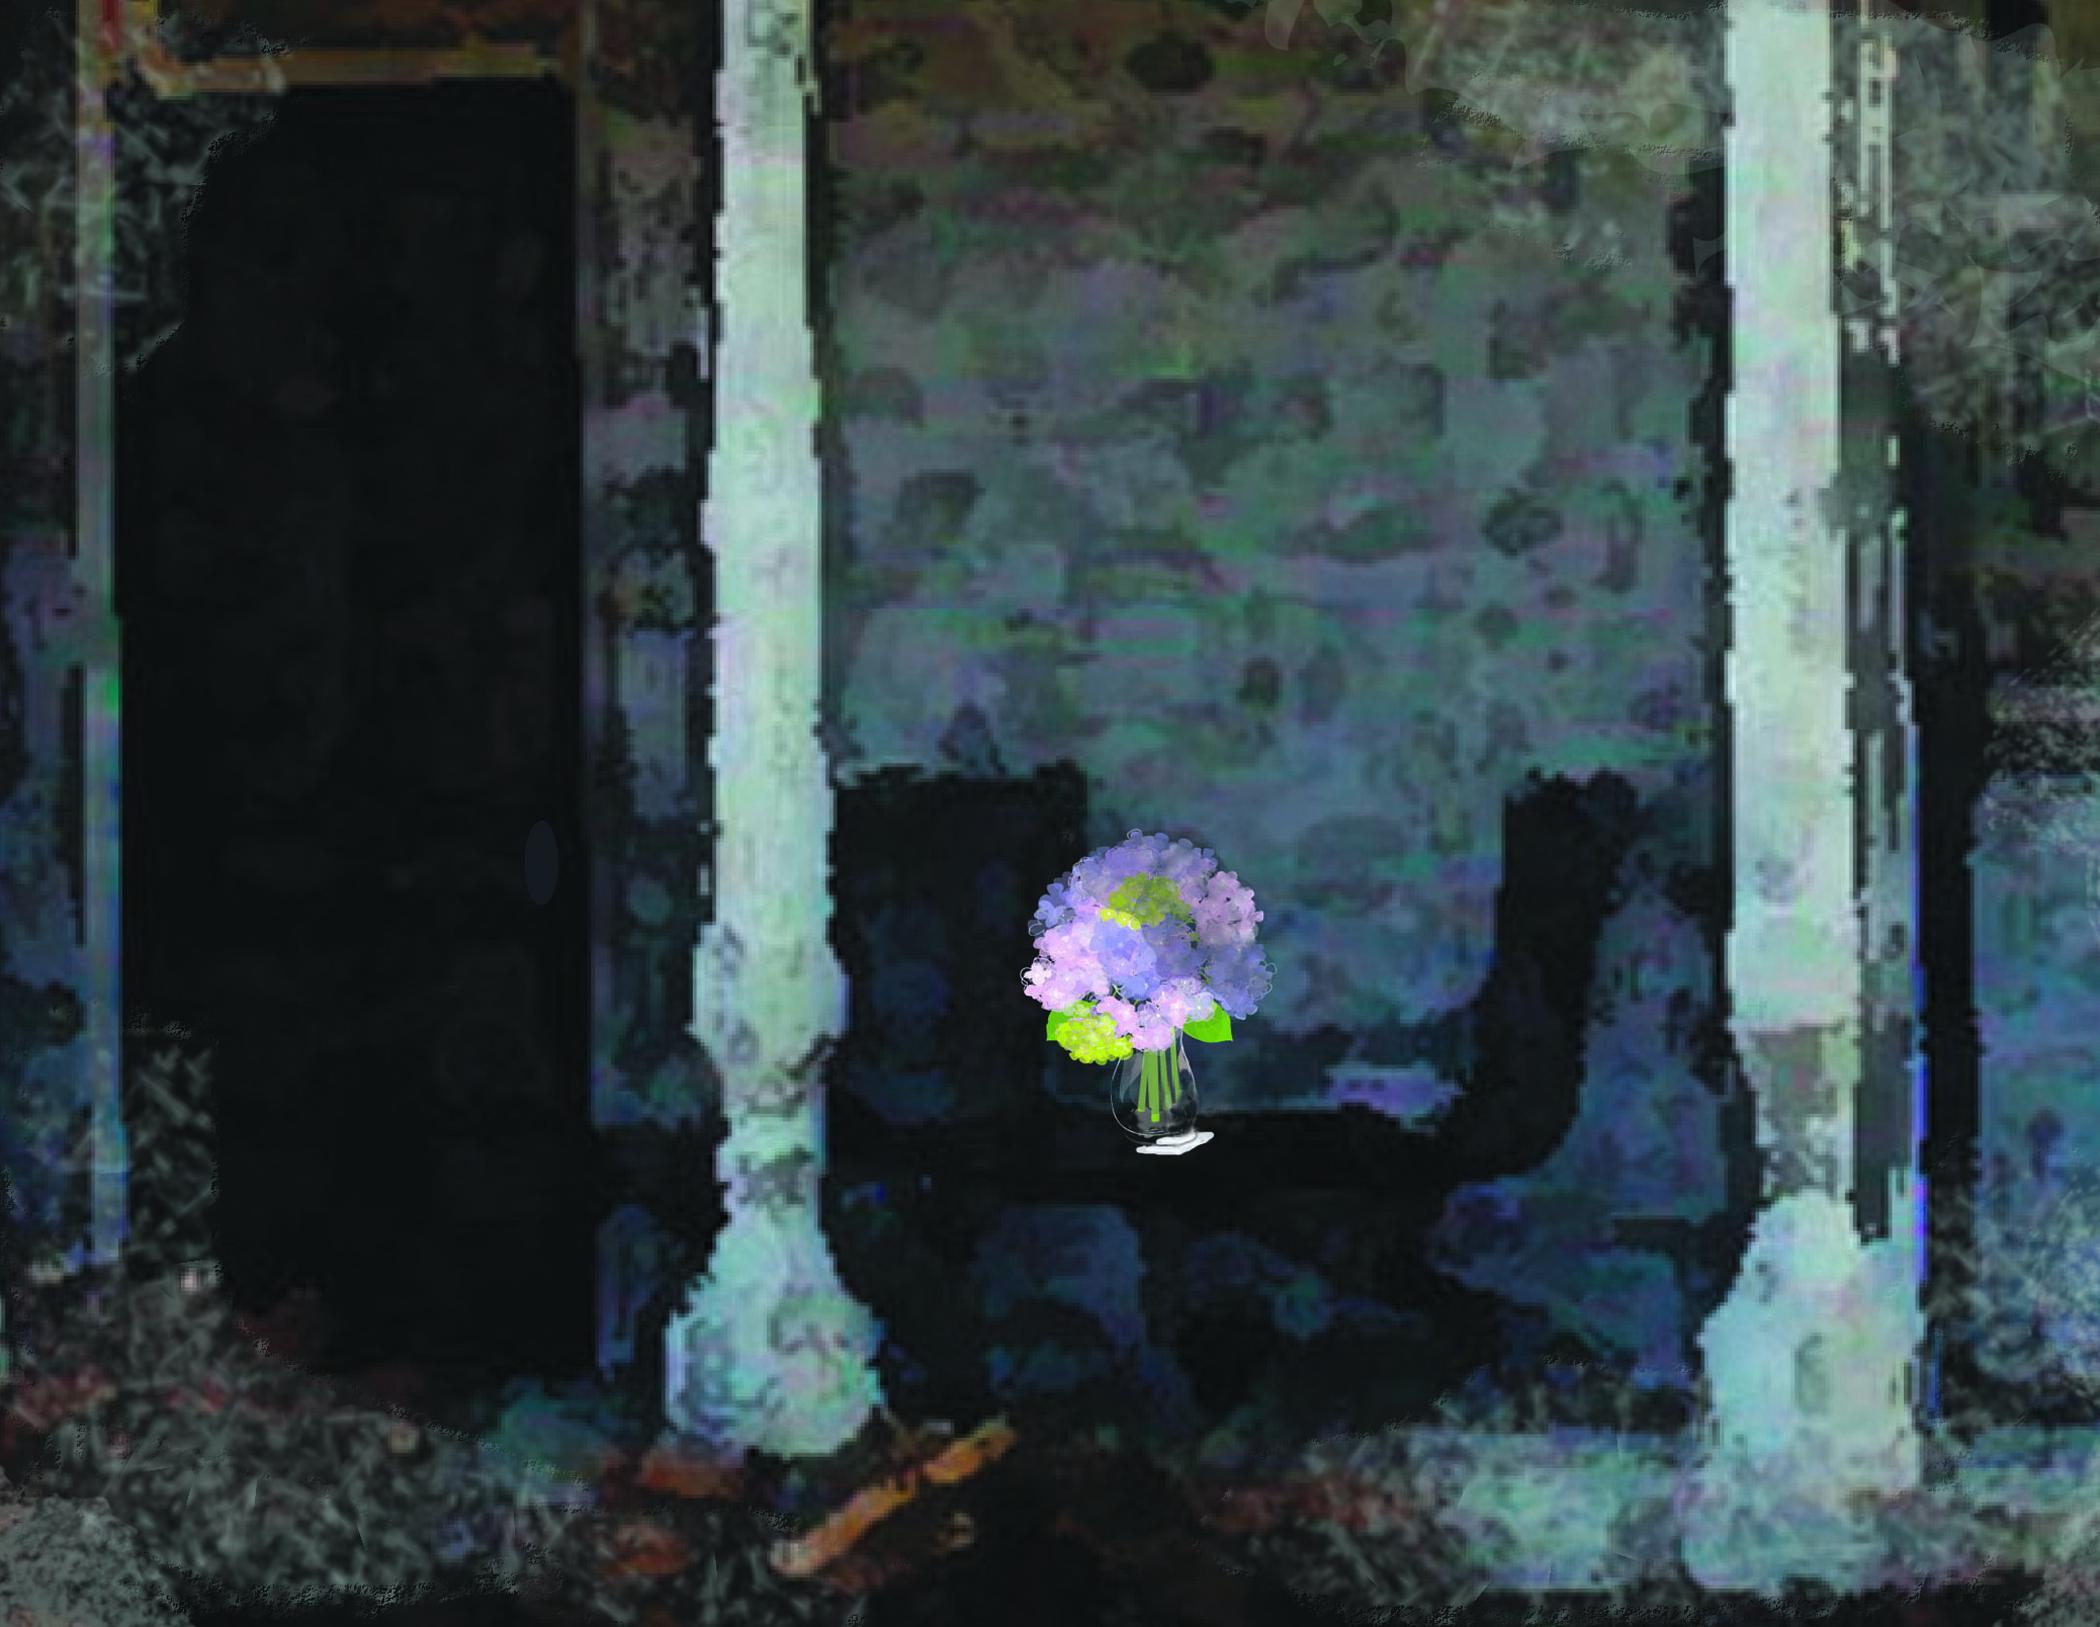 Hydrangeas on Porch illustration by Linda Santell